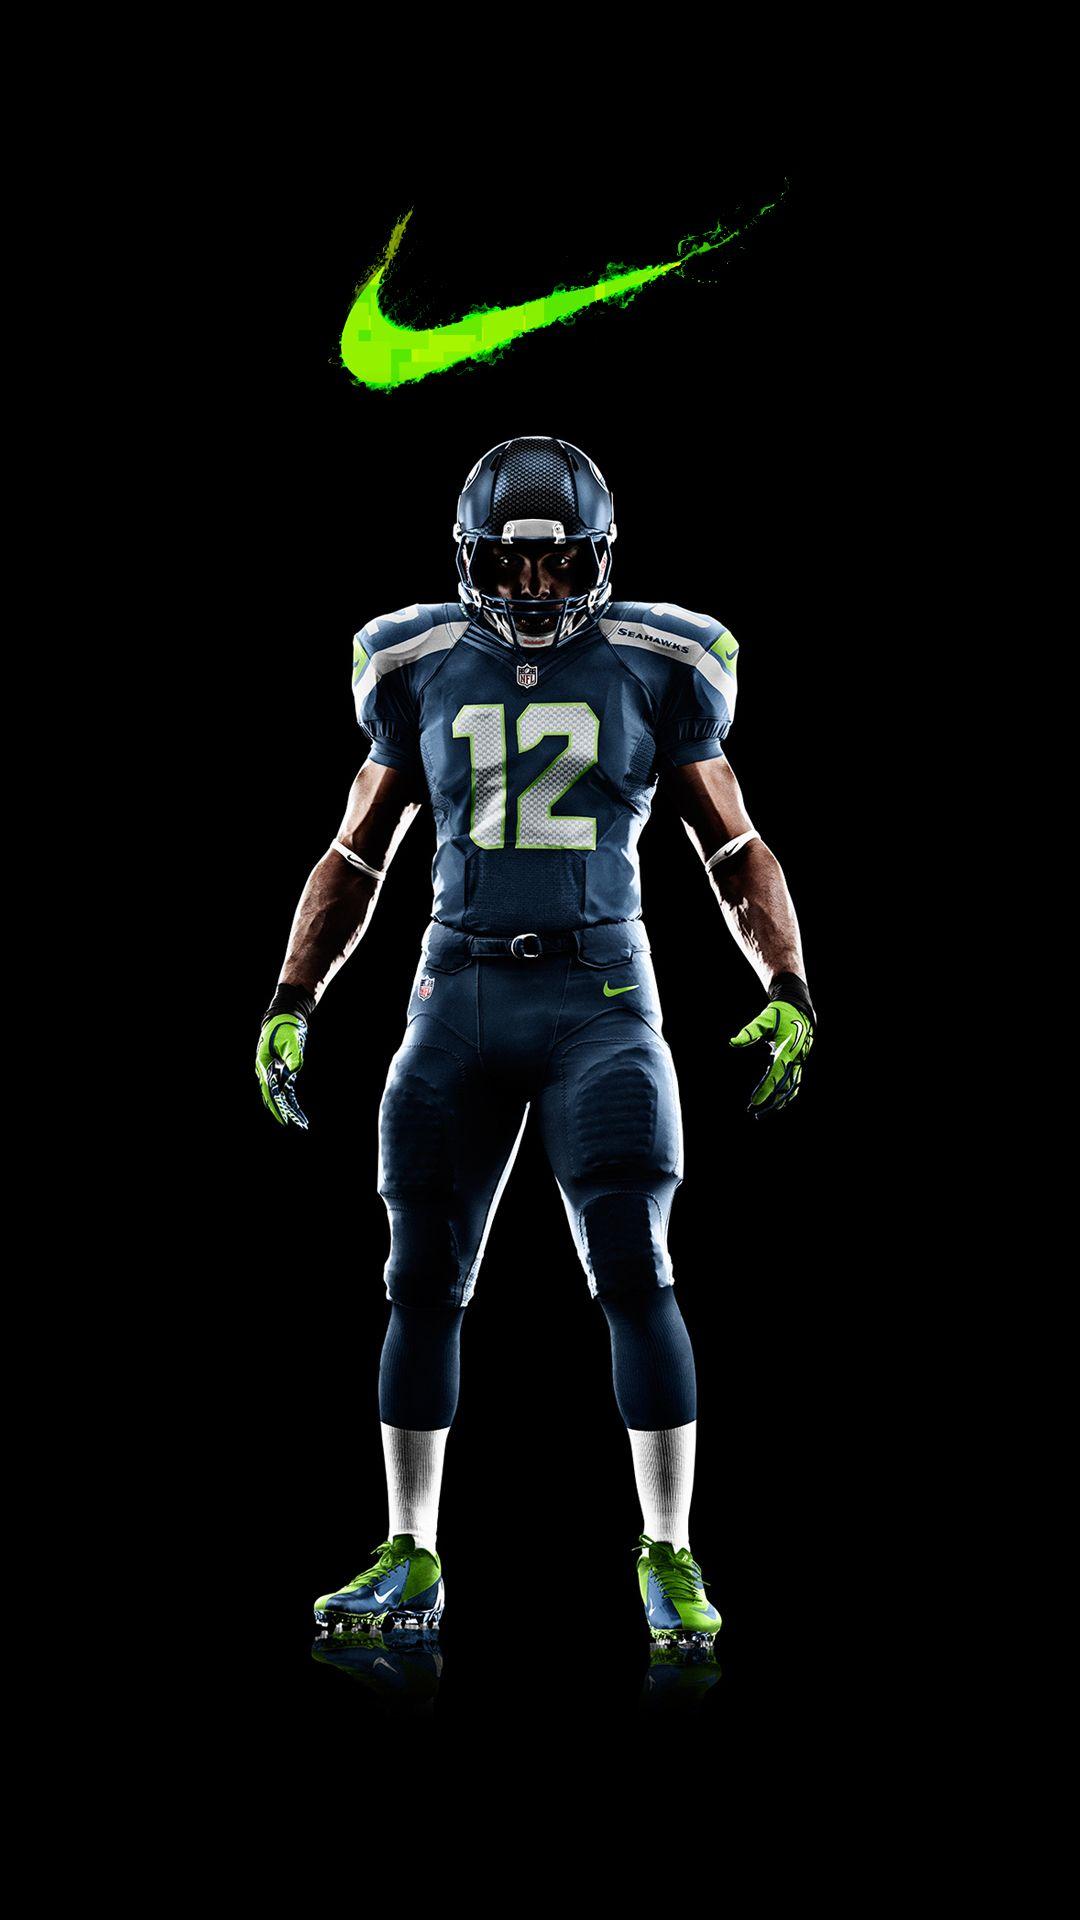 b10f1fe6c Pin by Mark Baker on Hawks | Nike football, Football uniforms ...